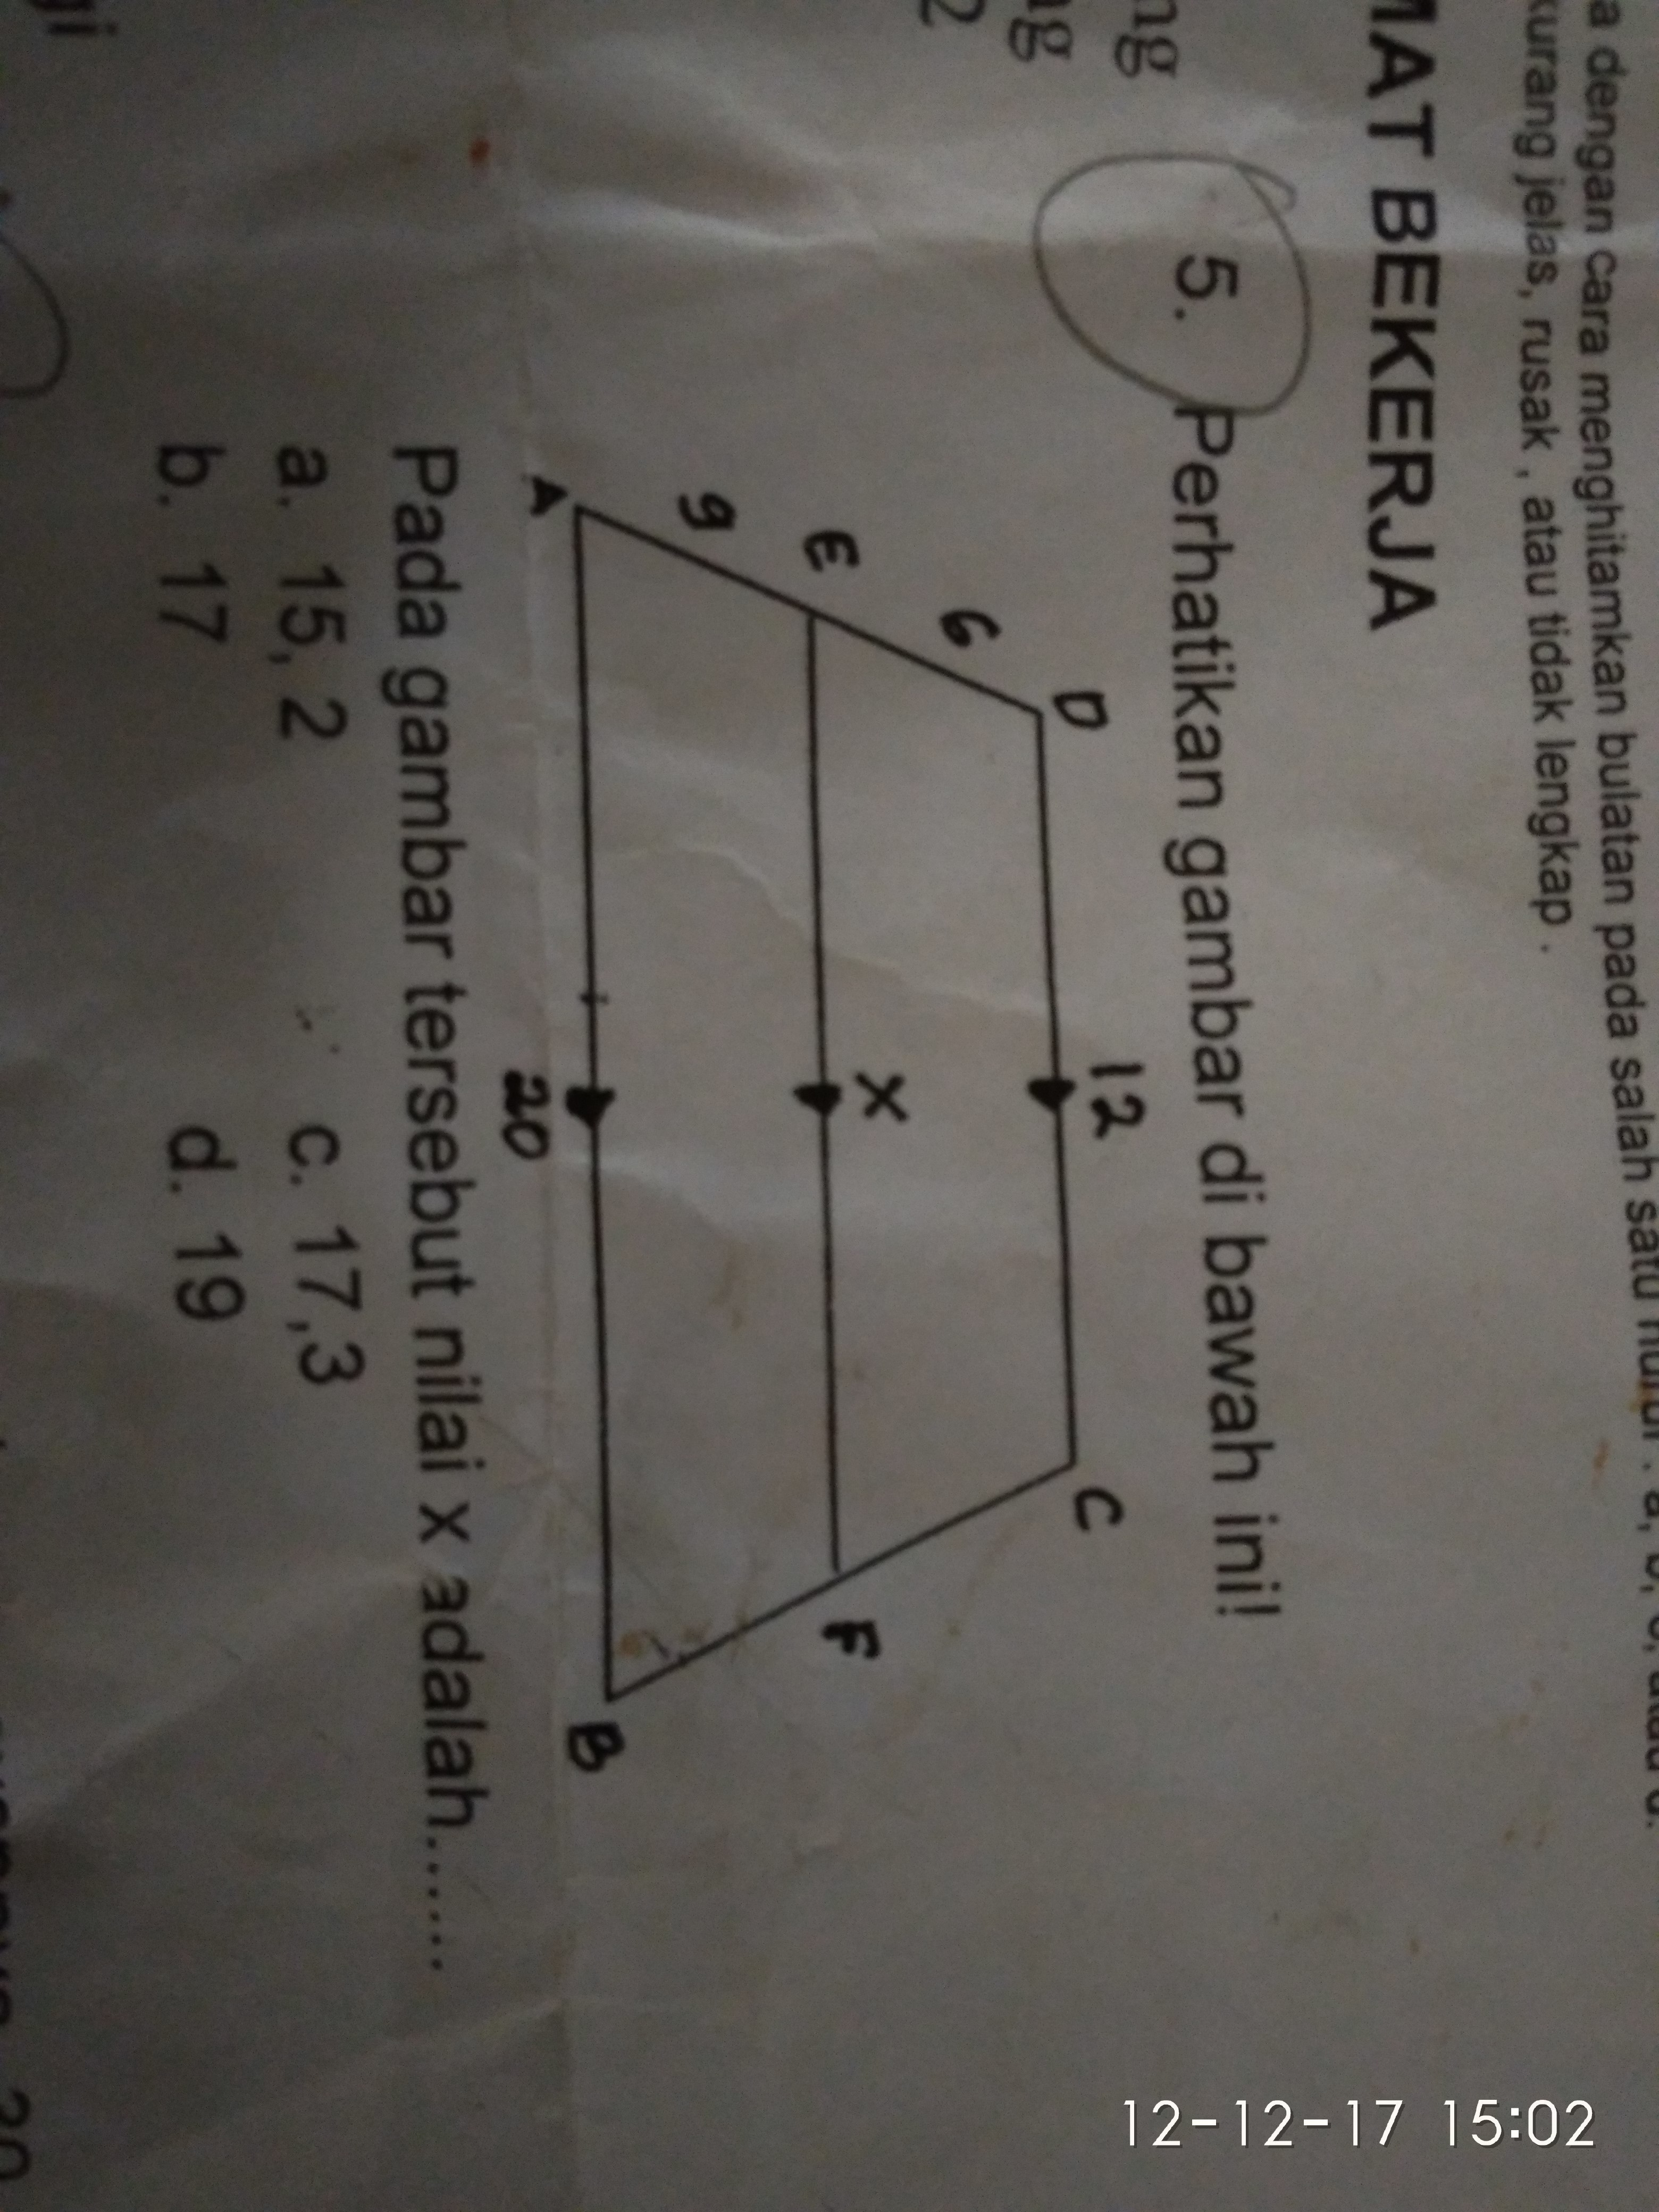 perhatikan gambar dibawah ini,Pada gambar tersebut nilai x ...